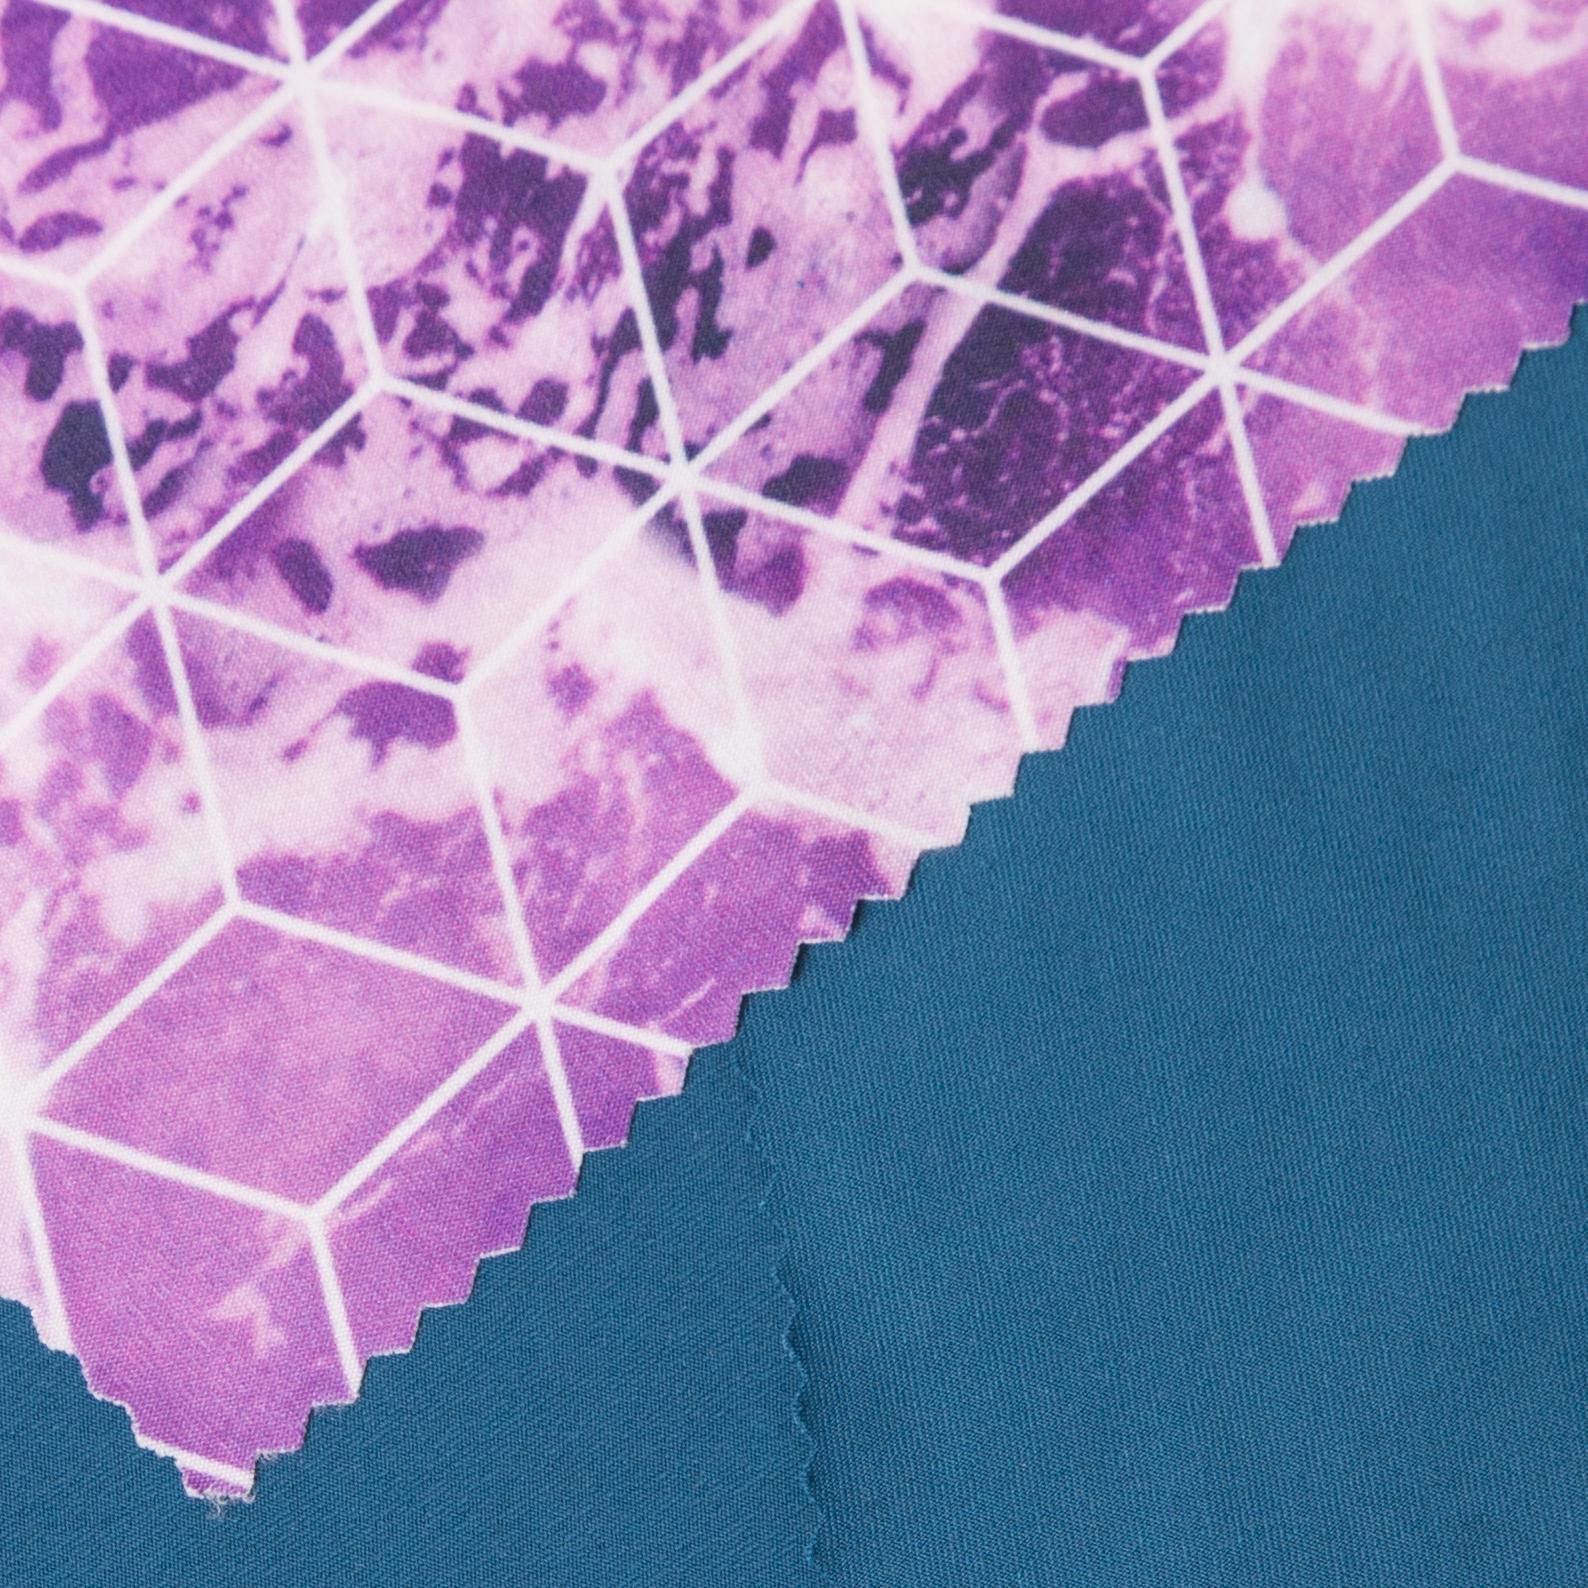 fabric1sq.jpg